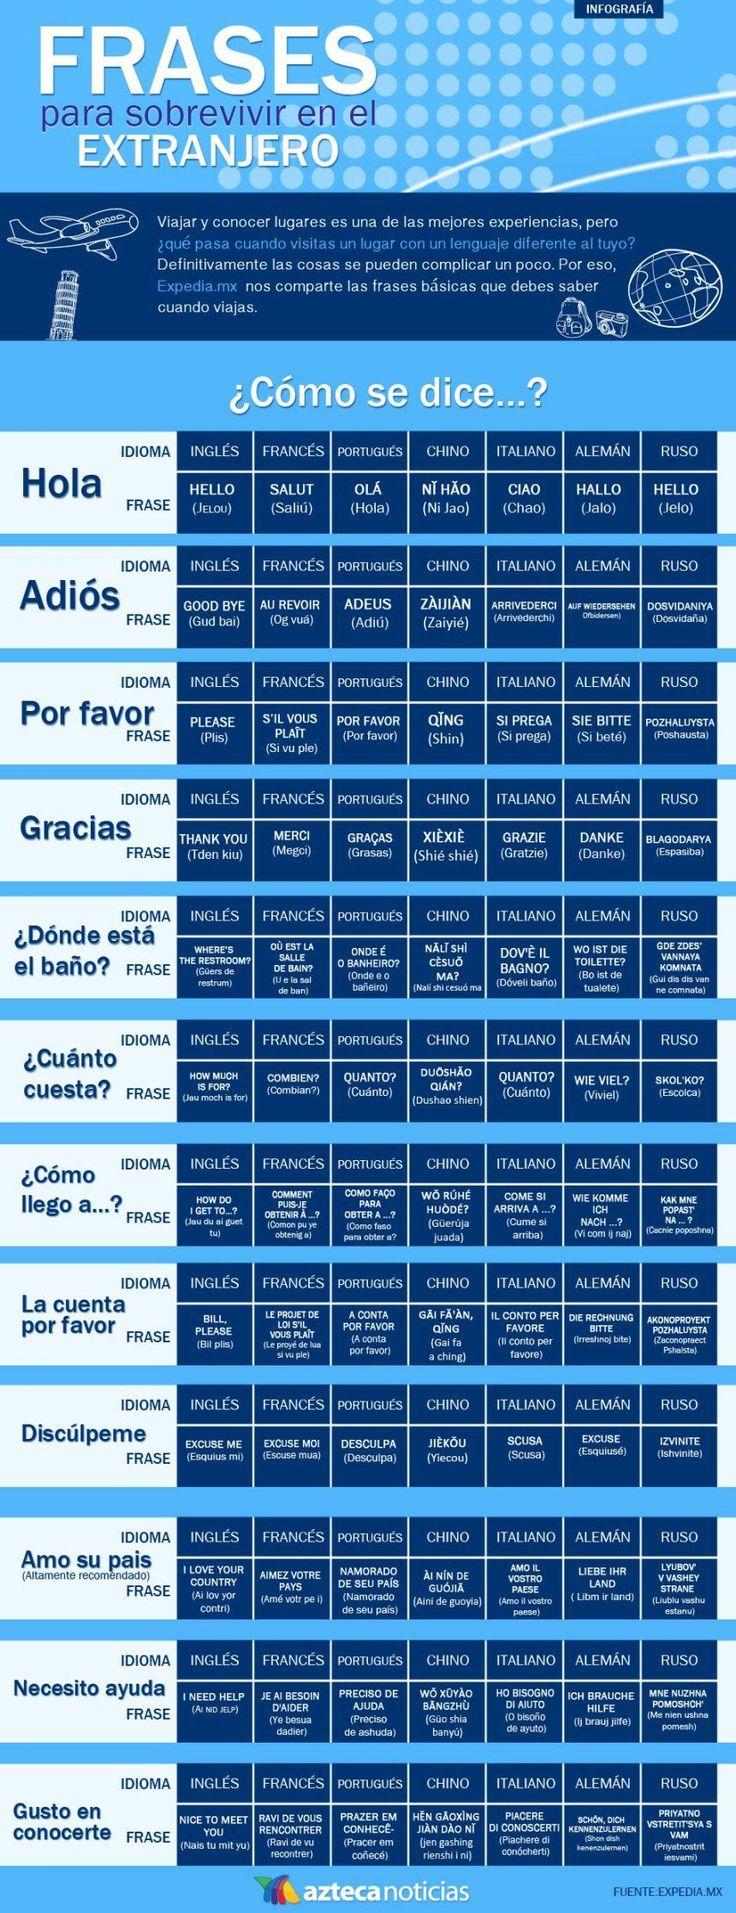 Frases para sobrevivir en el extranjero #infografia